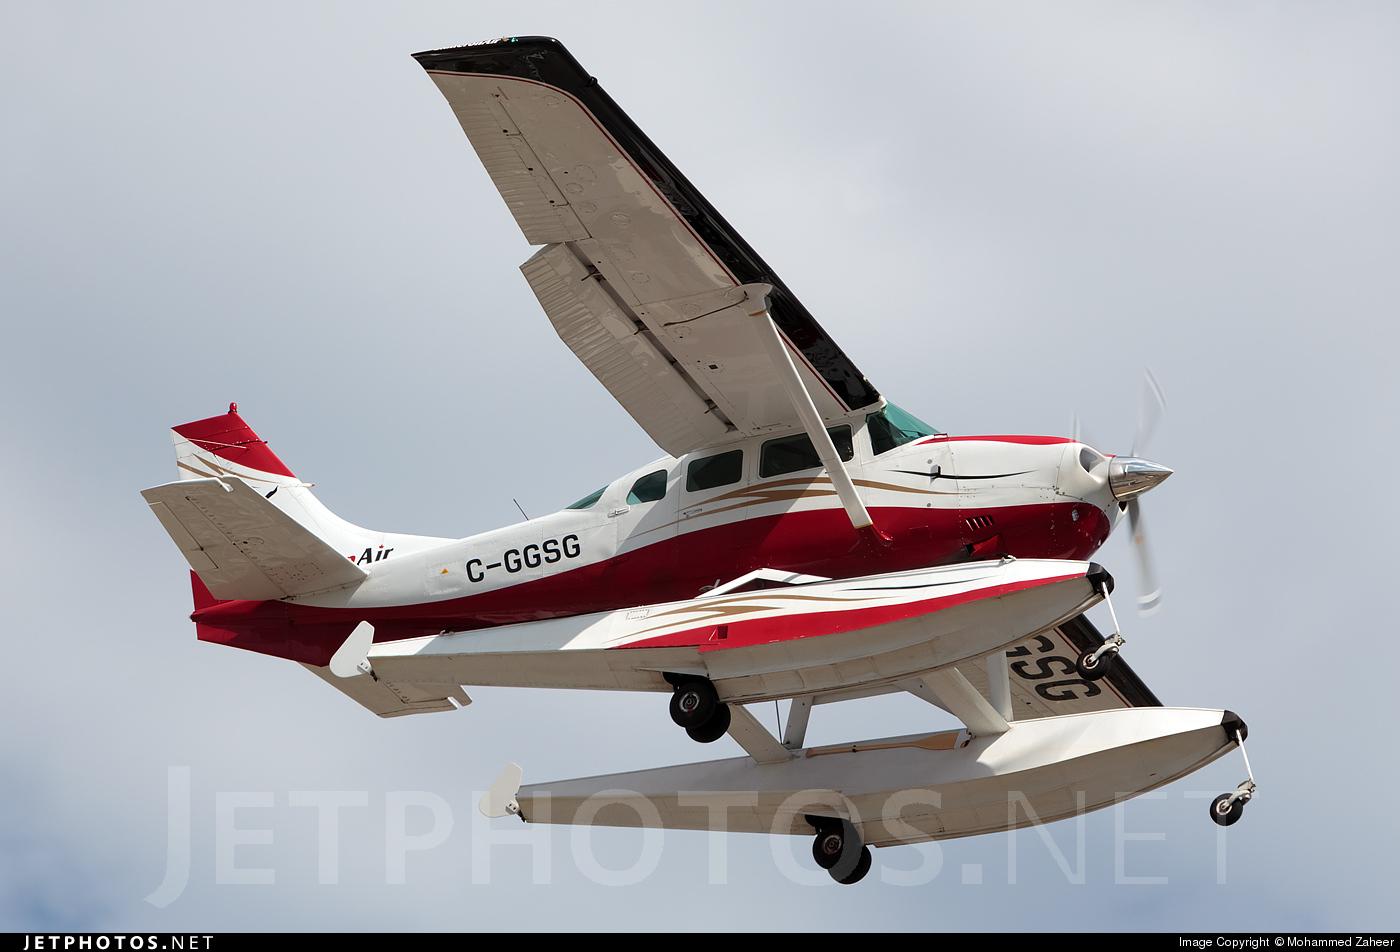 C-GGSG - Cessna TU206G Turbo Stationair - Cameron Air Service